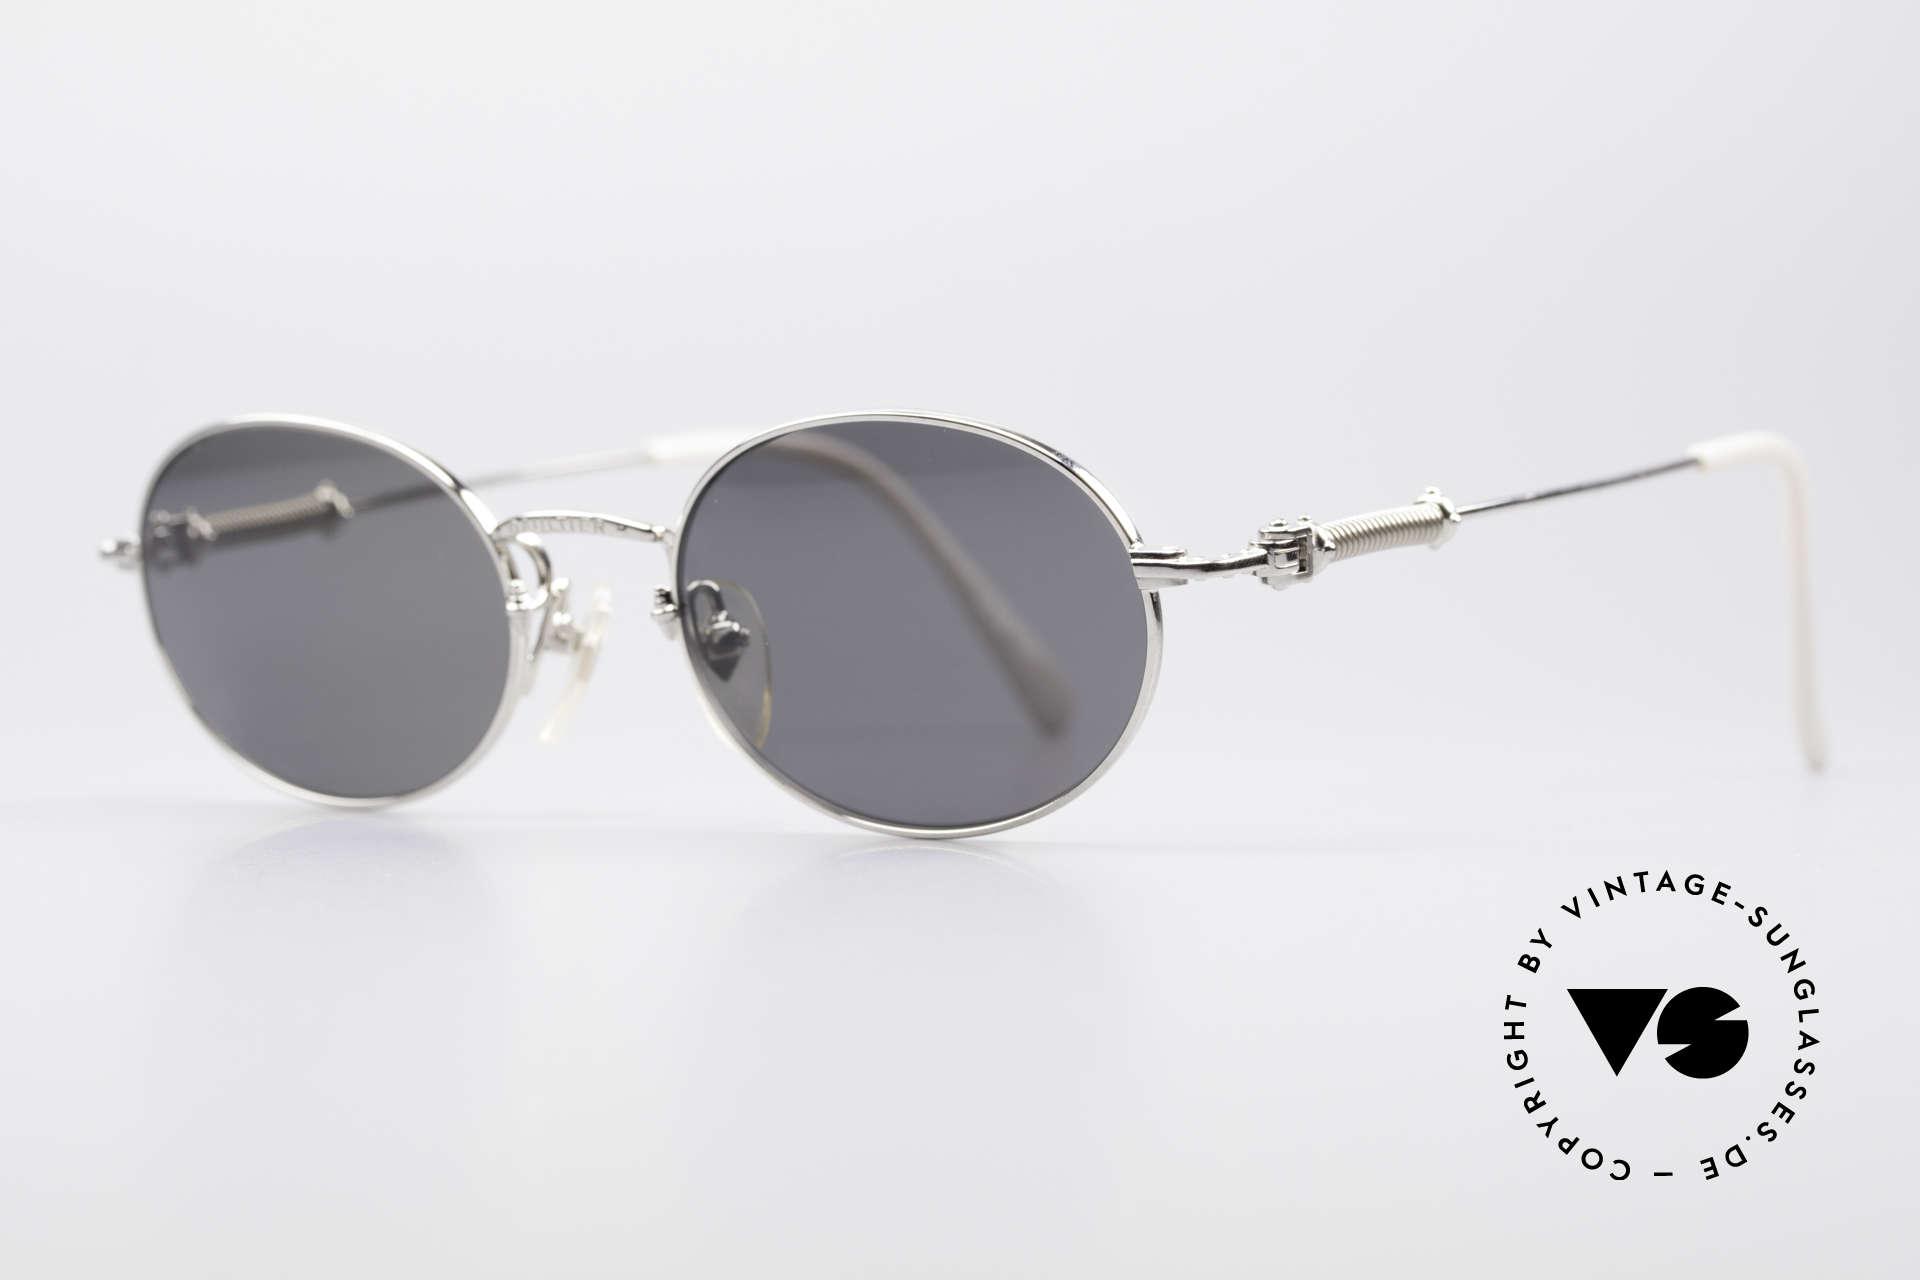 Jean Paul Gaultier 55-6101 Polarized Oval Sunglasses, POLARIZED sun lenses (for 100% UV protection), Made for Men and Women